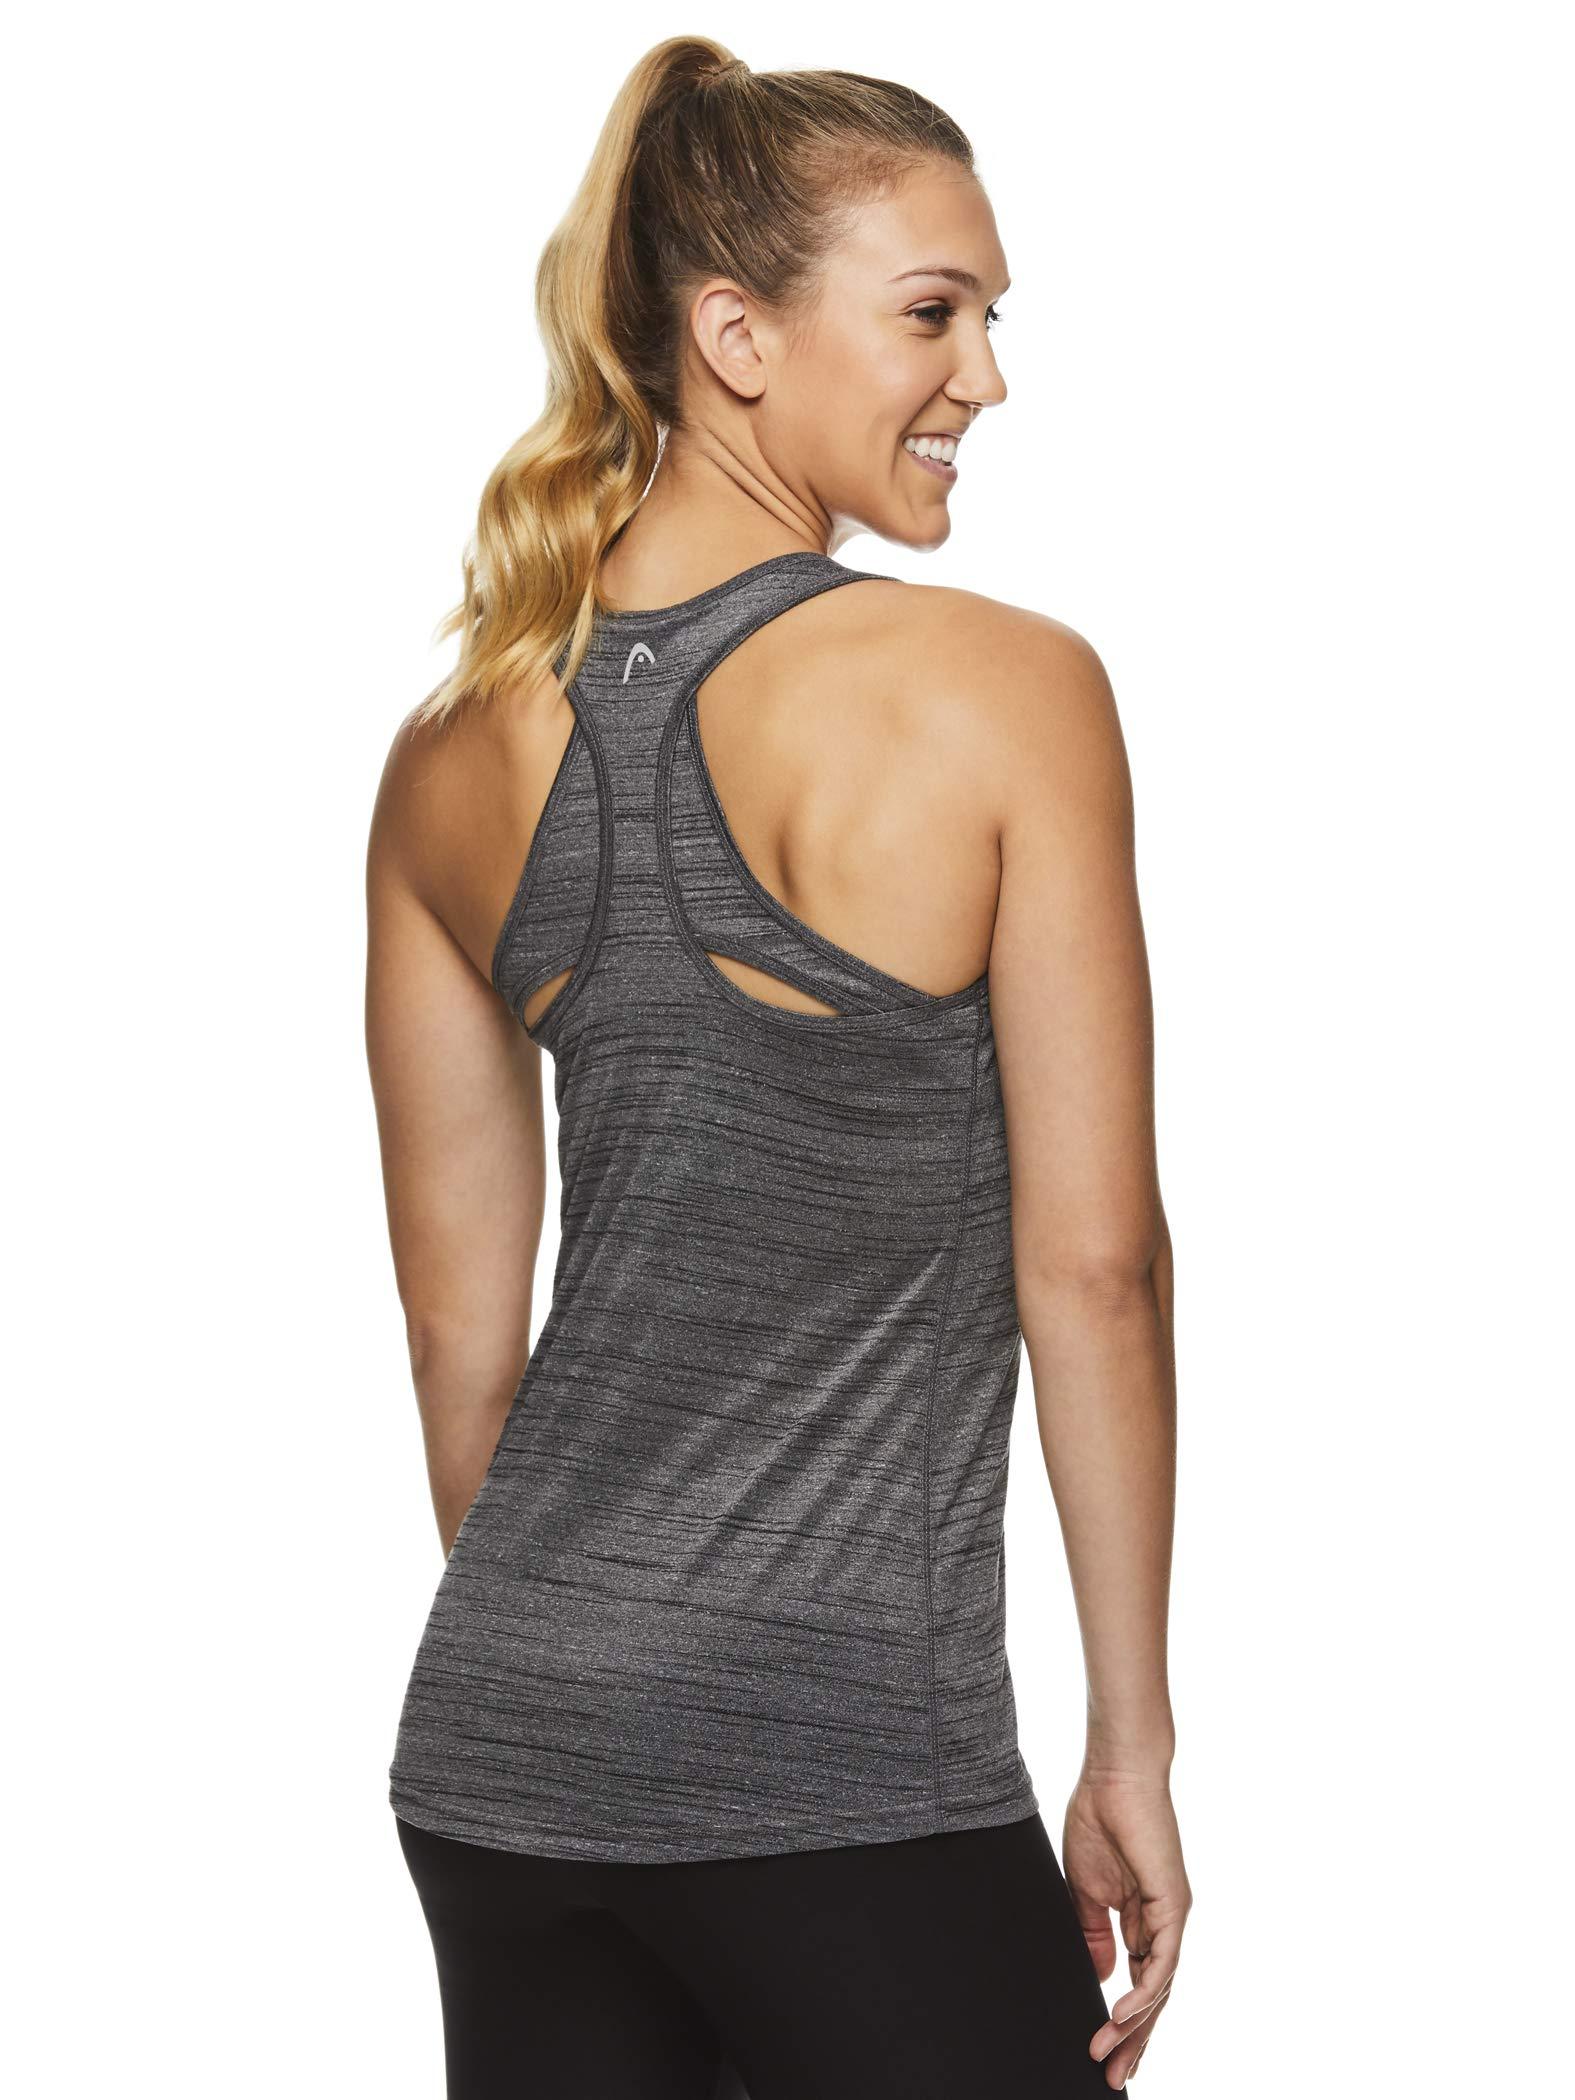 HEAD Women's Racerback Tank Top - Sleeveless Flowy Performance Activewear Shirt - Perserverance Black Heather, X-Small